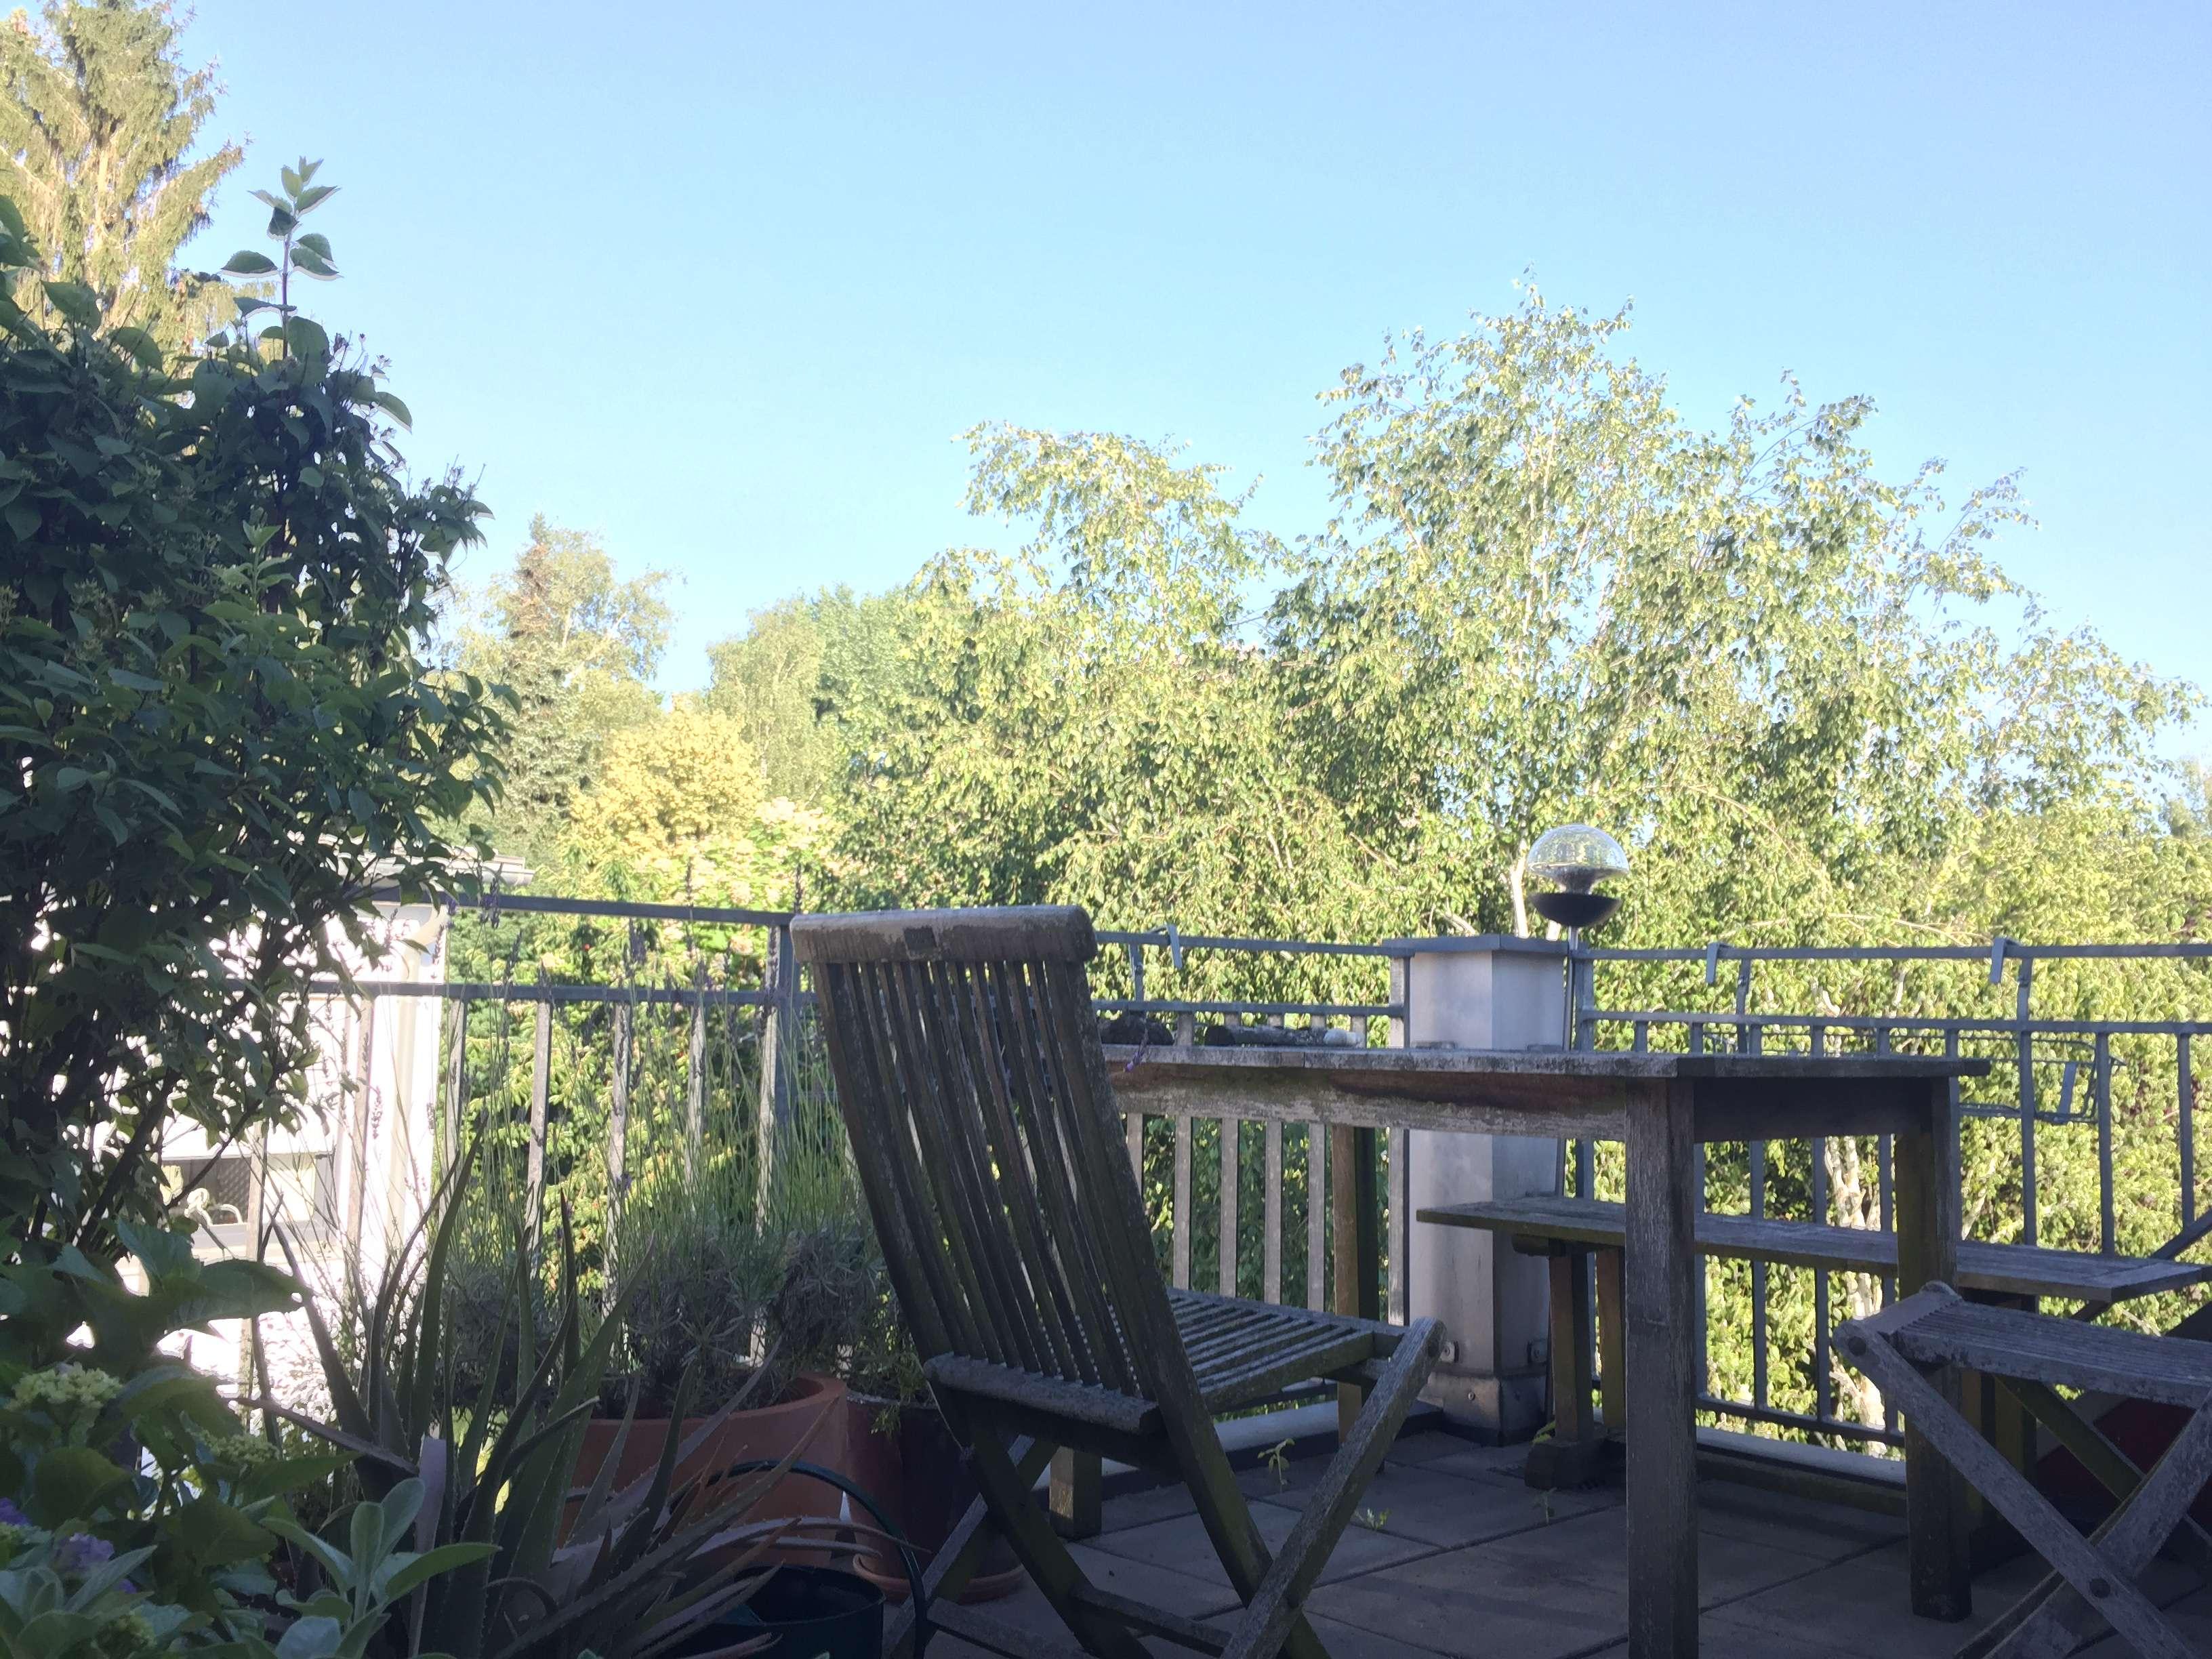 2 Zi. DG-Wohnung mit großzügigem Balkon, offener Wohnküche+EBK; Nähe Lech